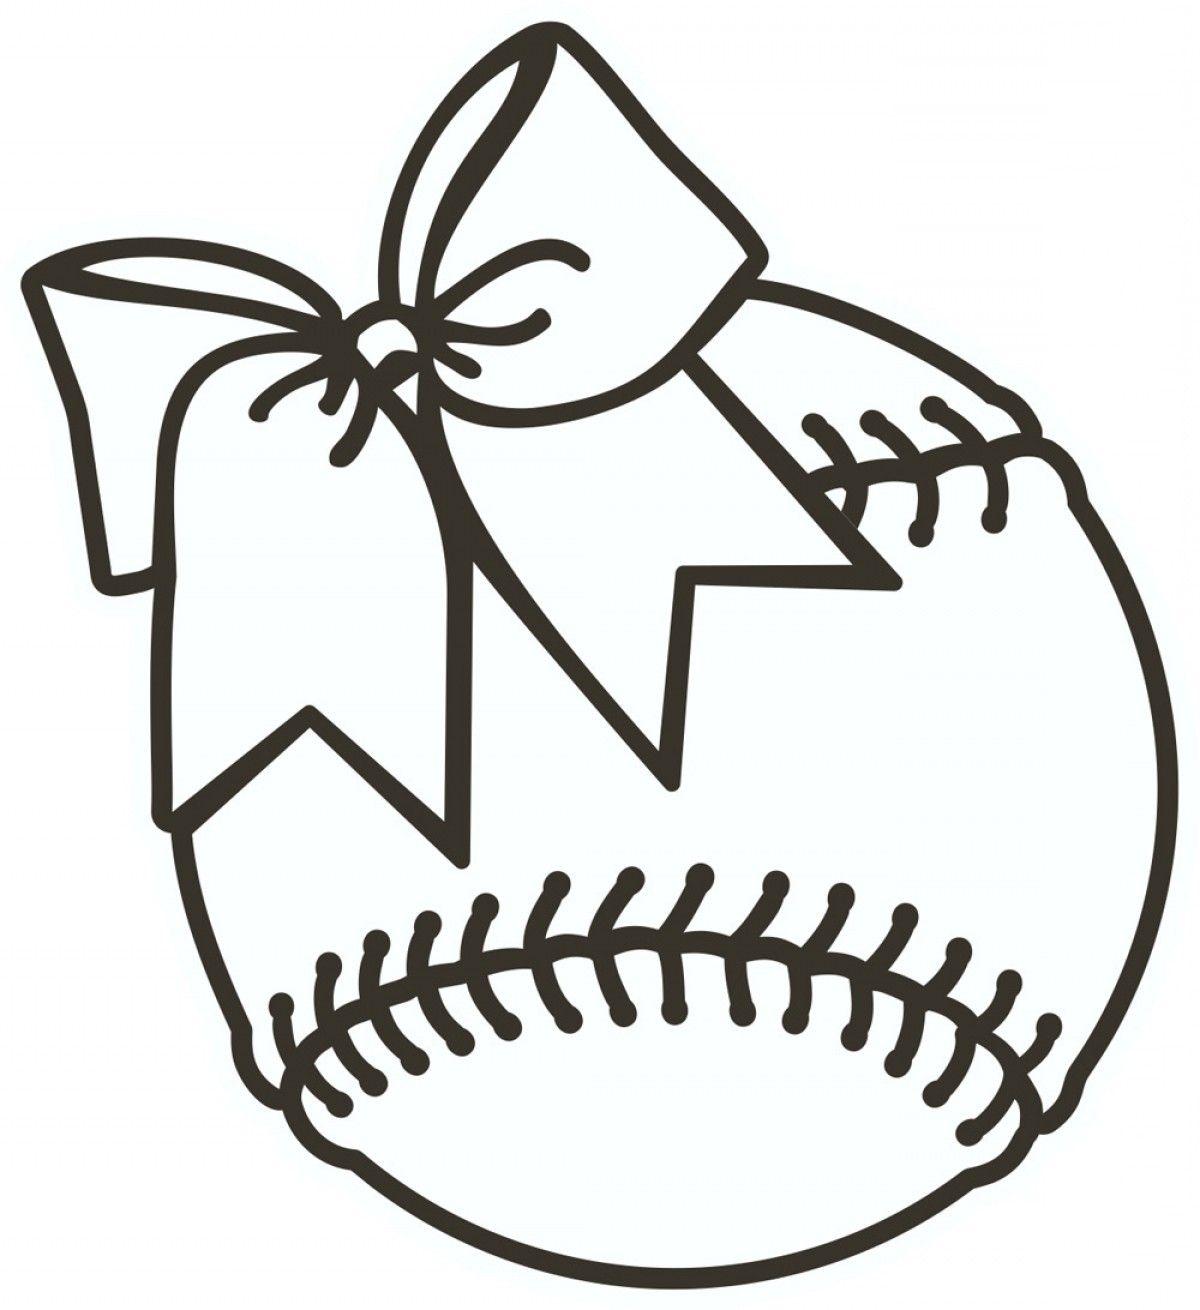 Softball Clipart Black And White